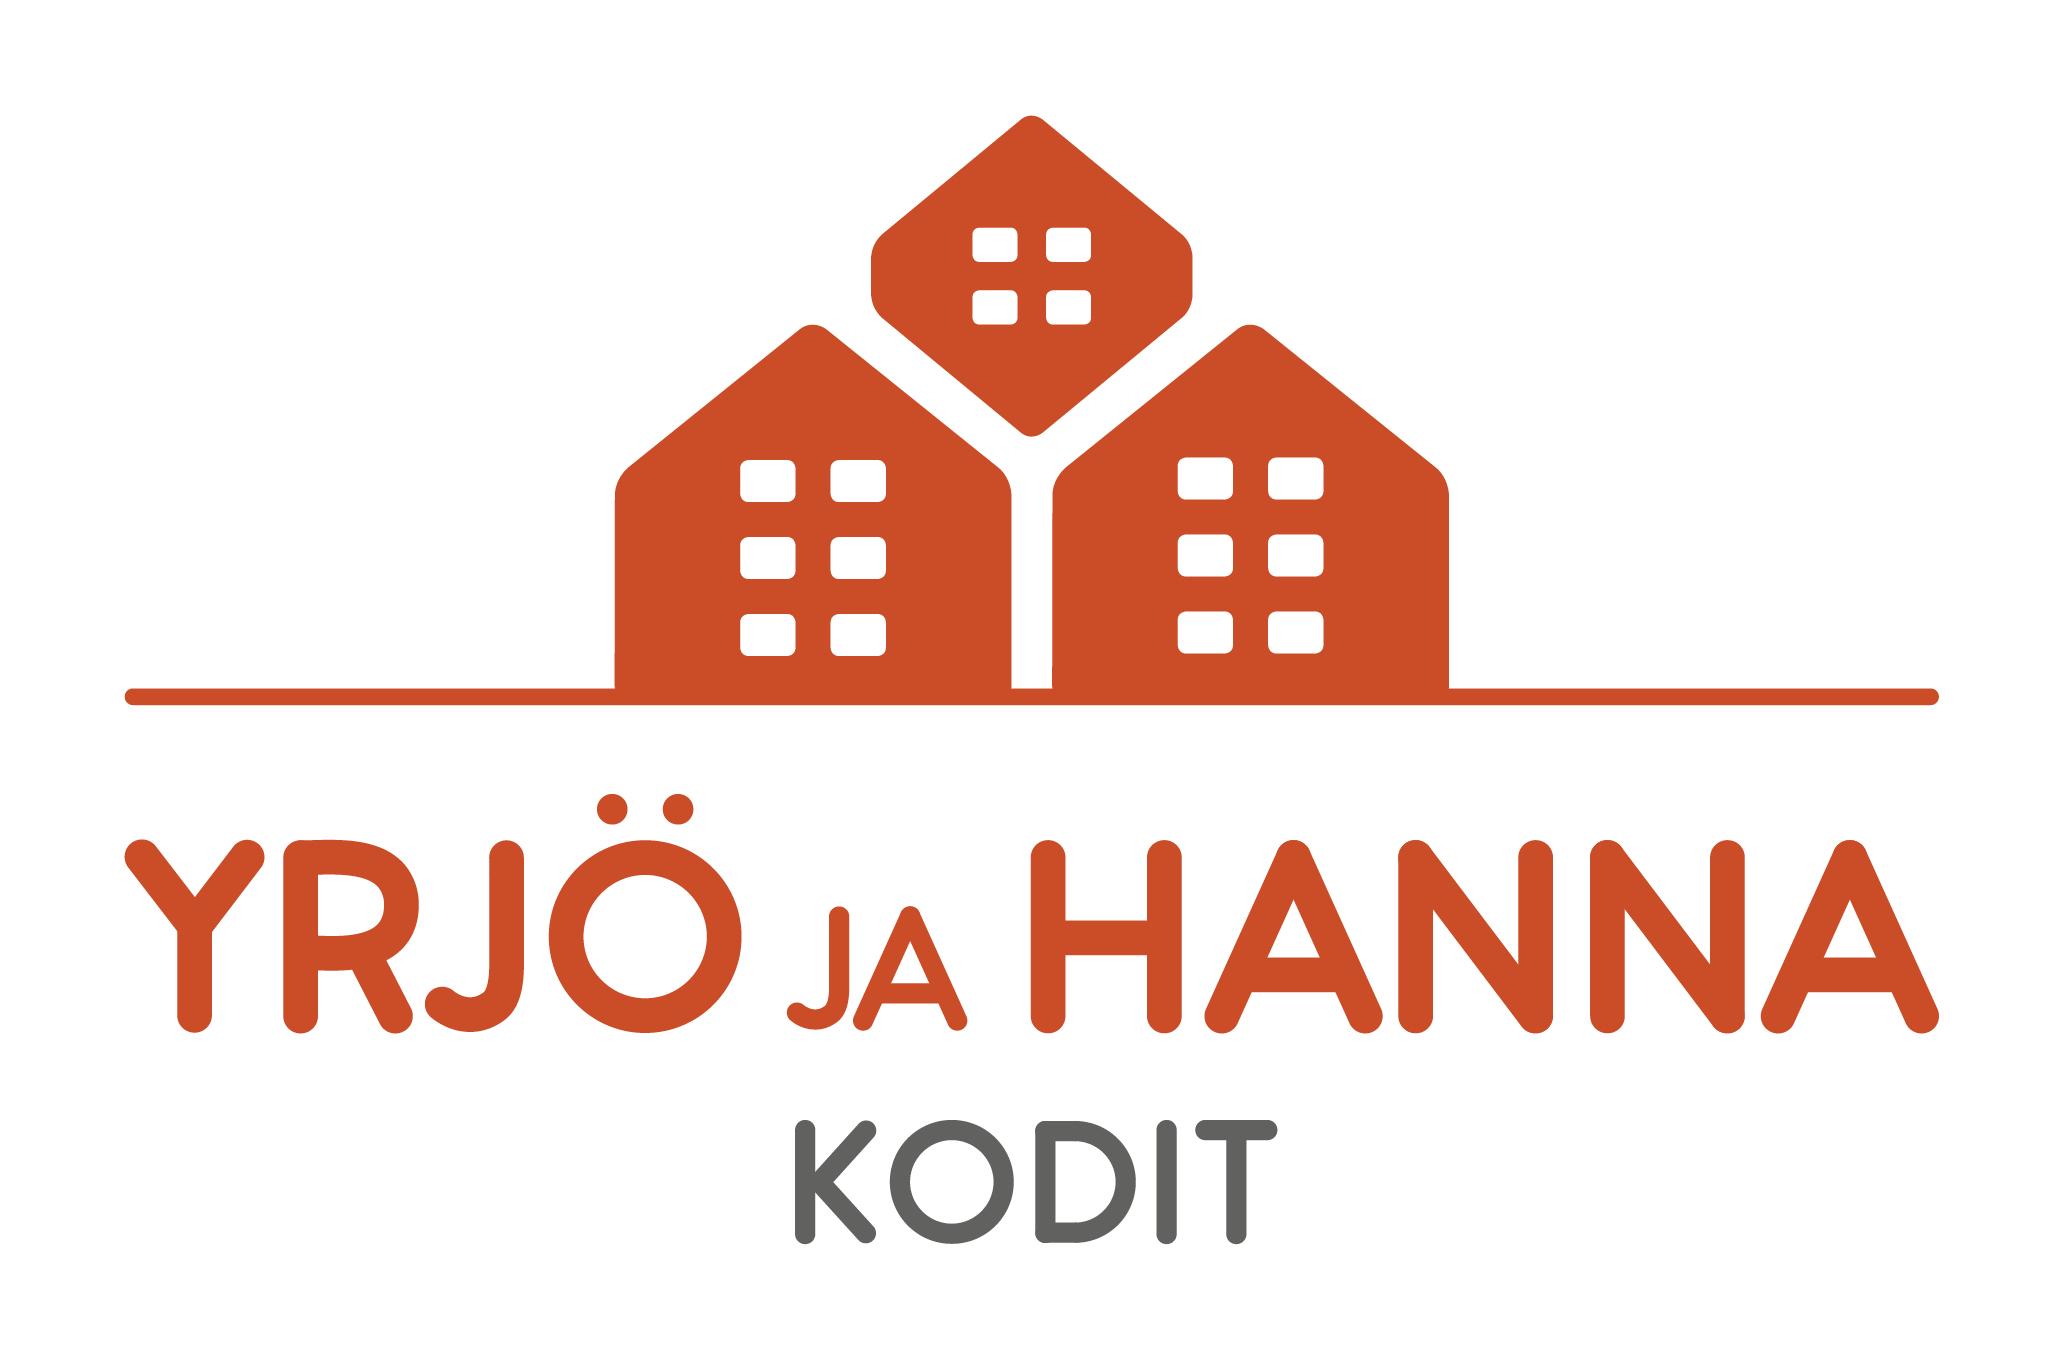 Yrjö ja Hanna Kodit logo